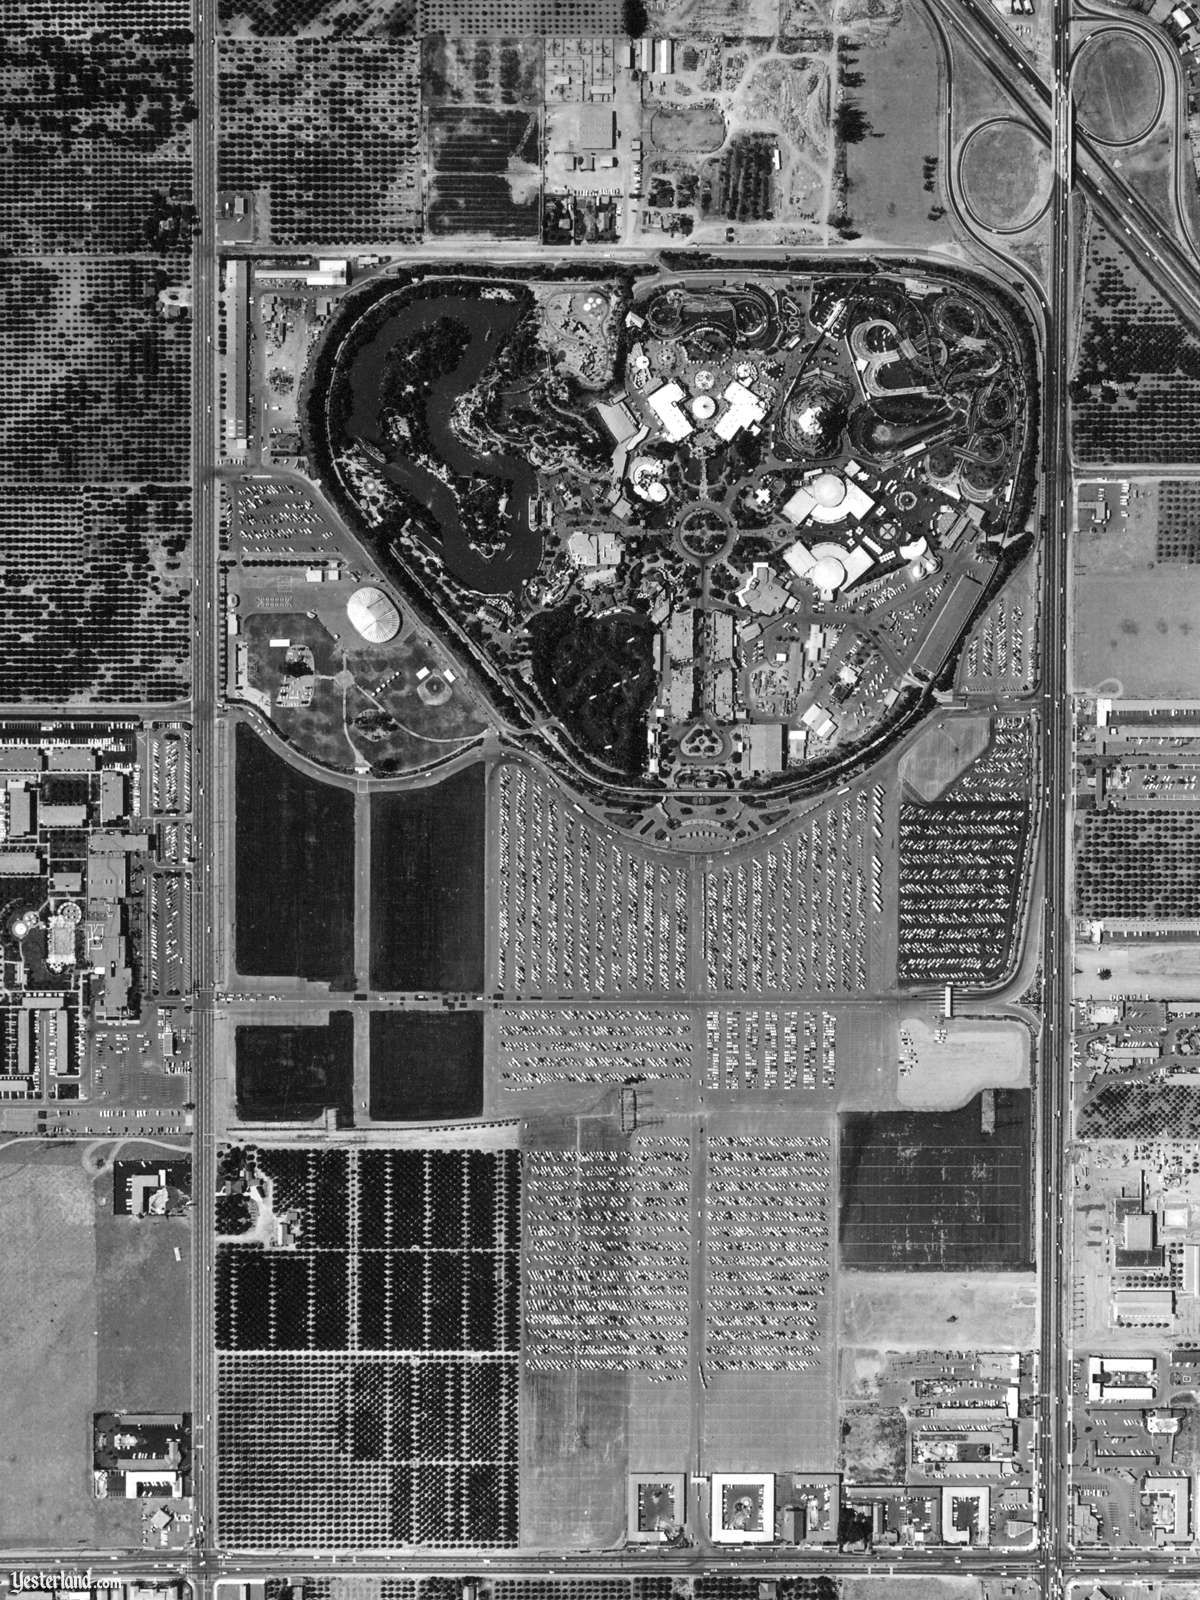 1960 - Disneyland Aerial. Holidayland